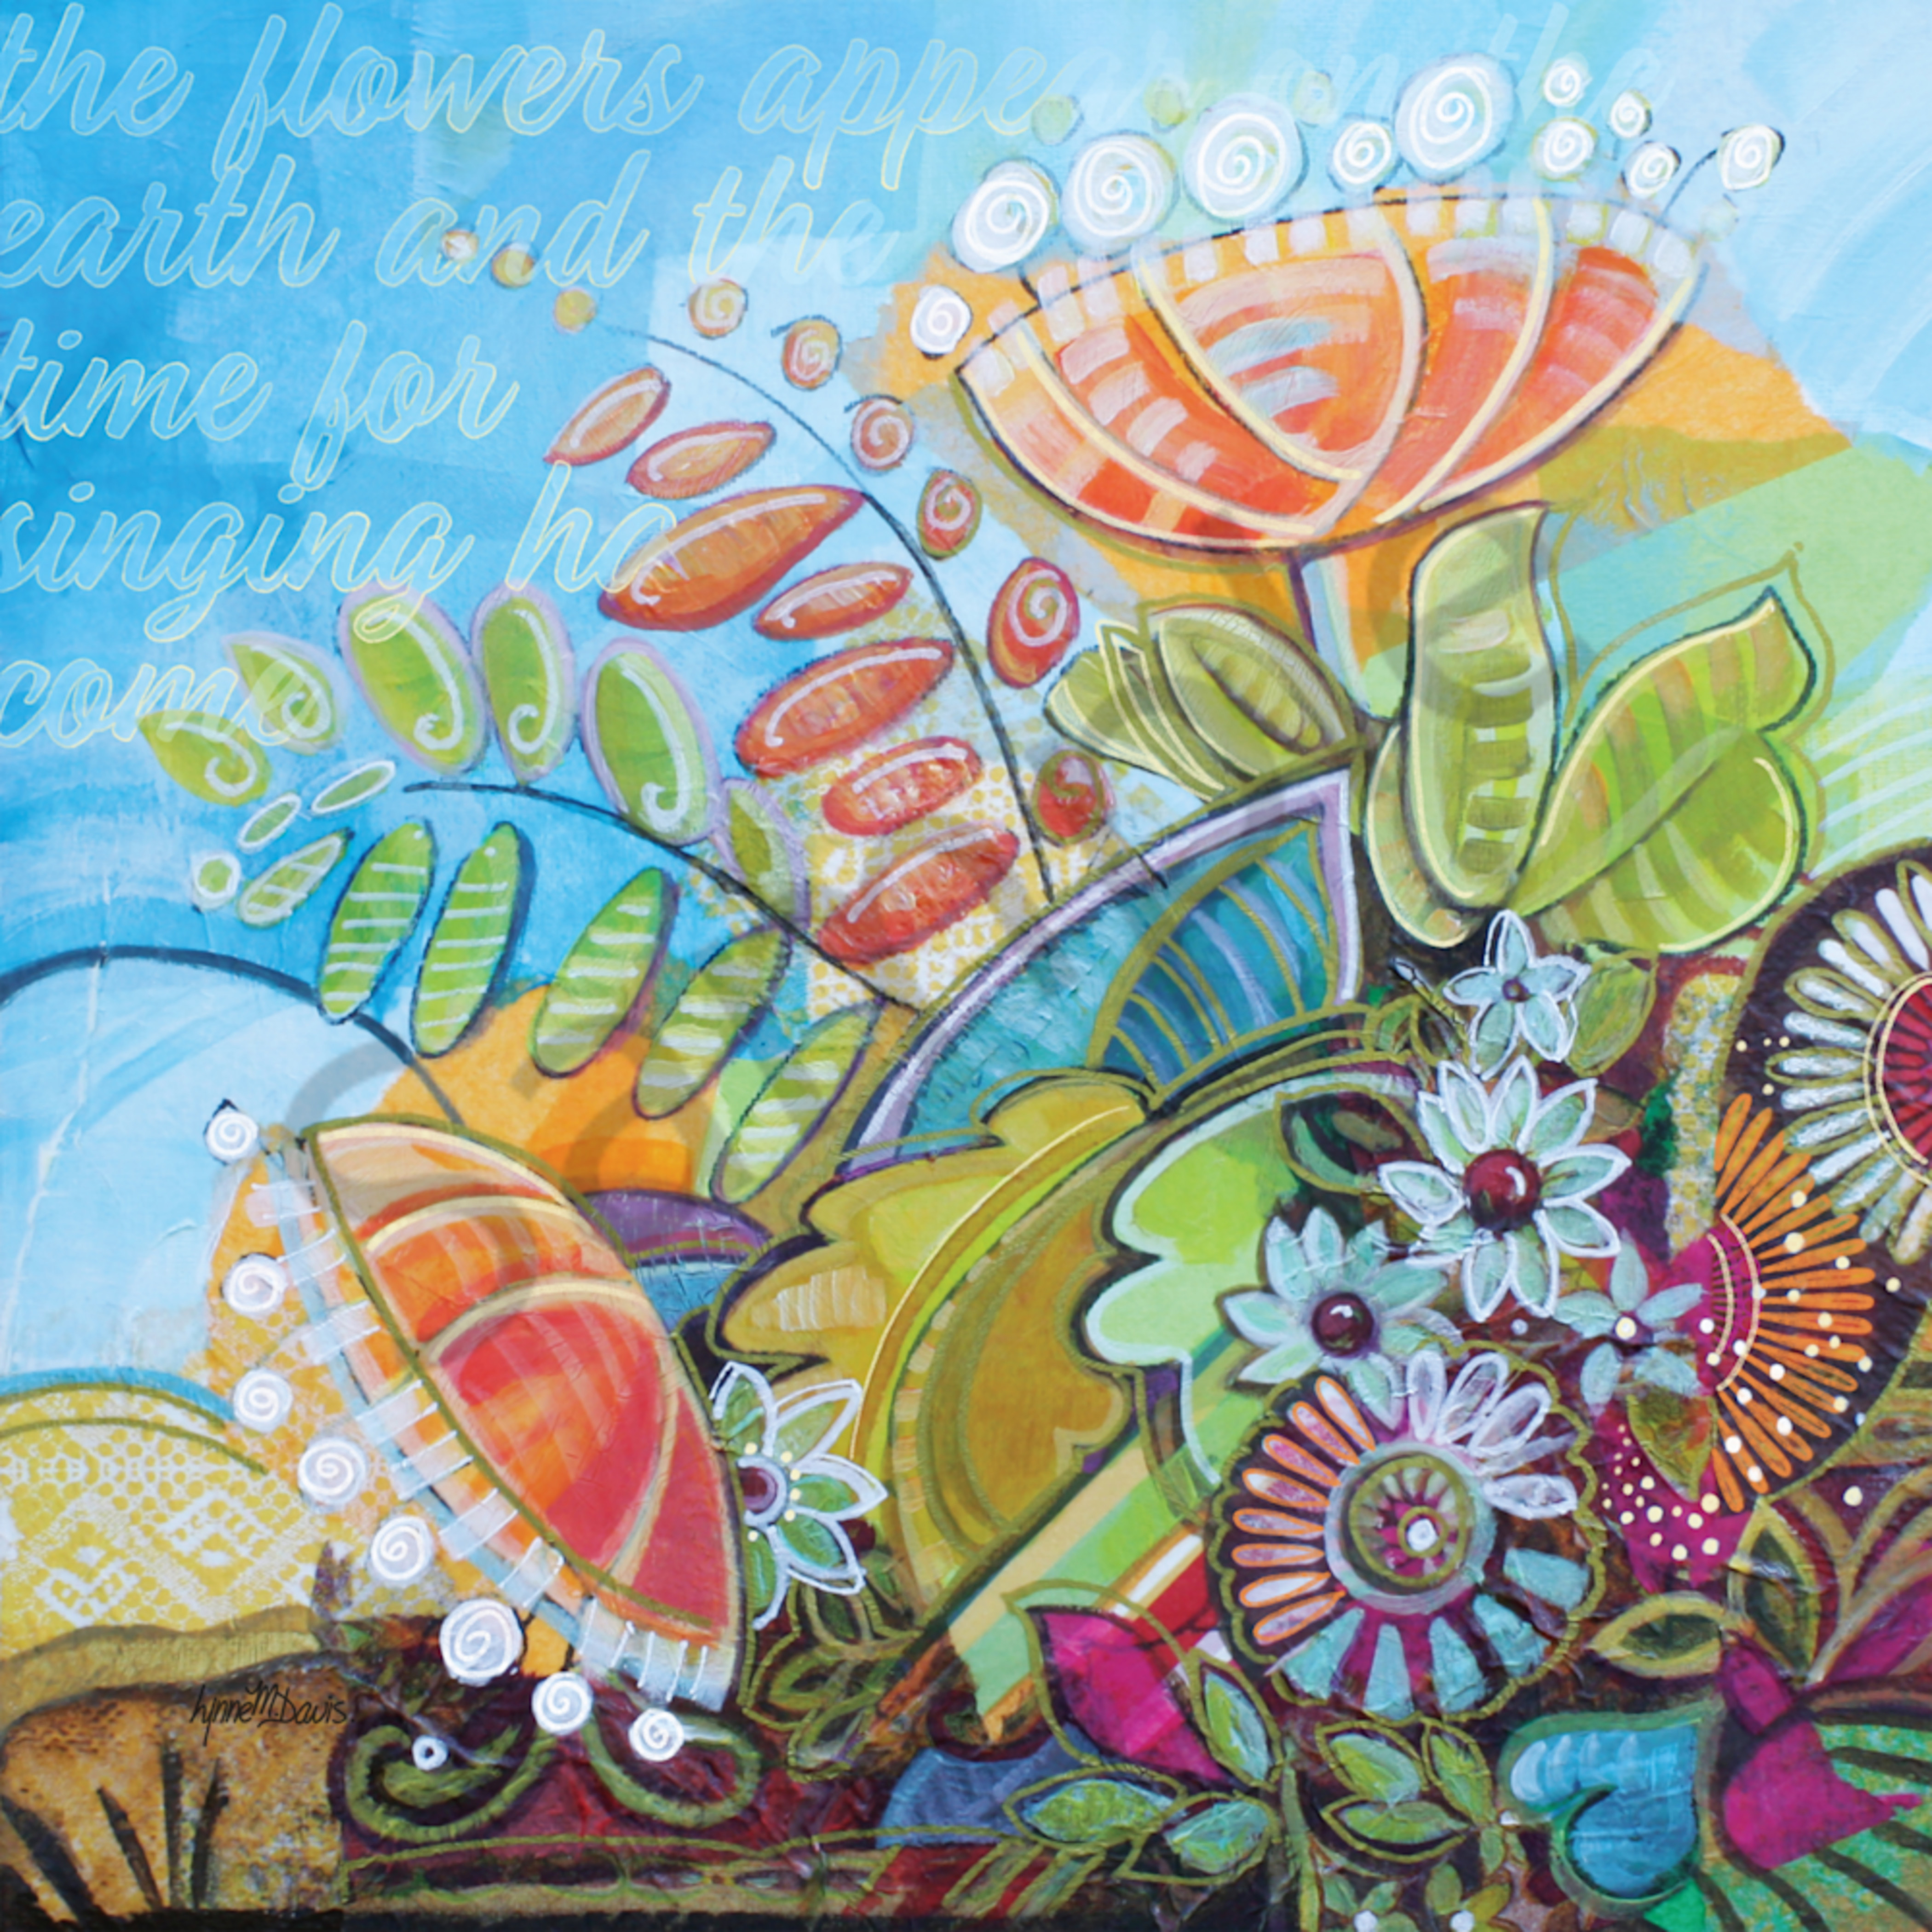 Spring flowers sing by lynne davis zw2dko